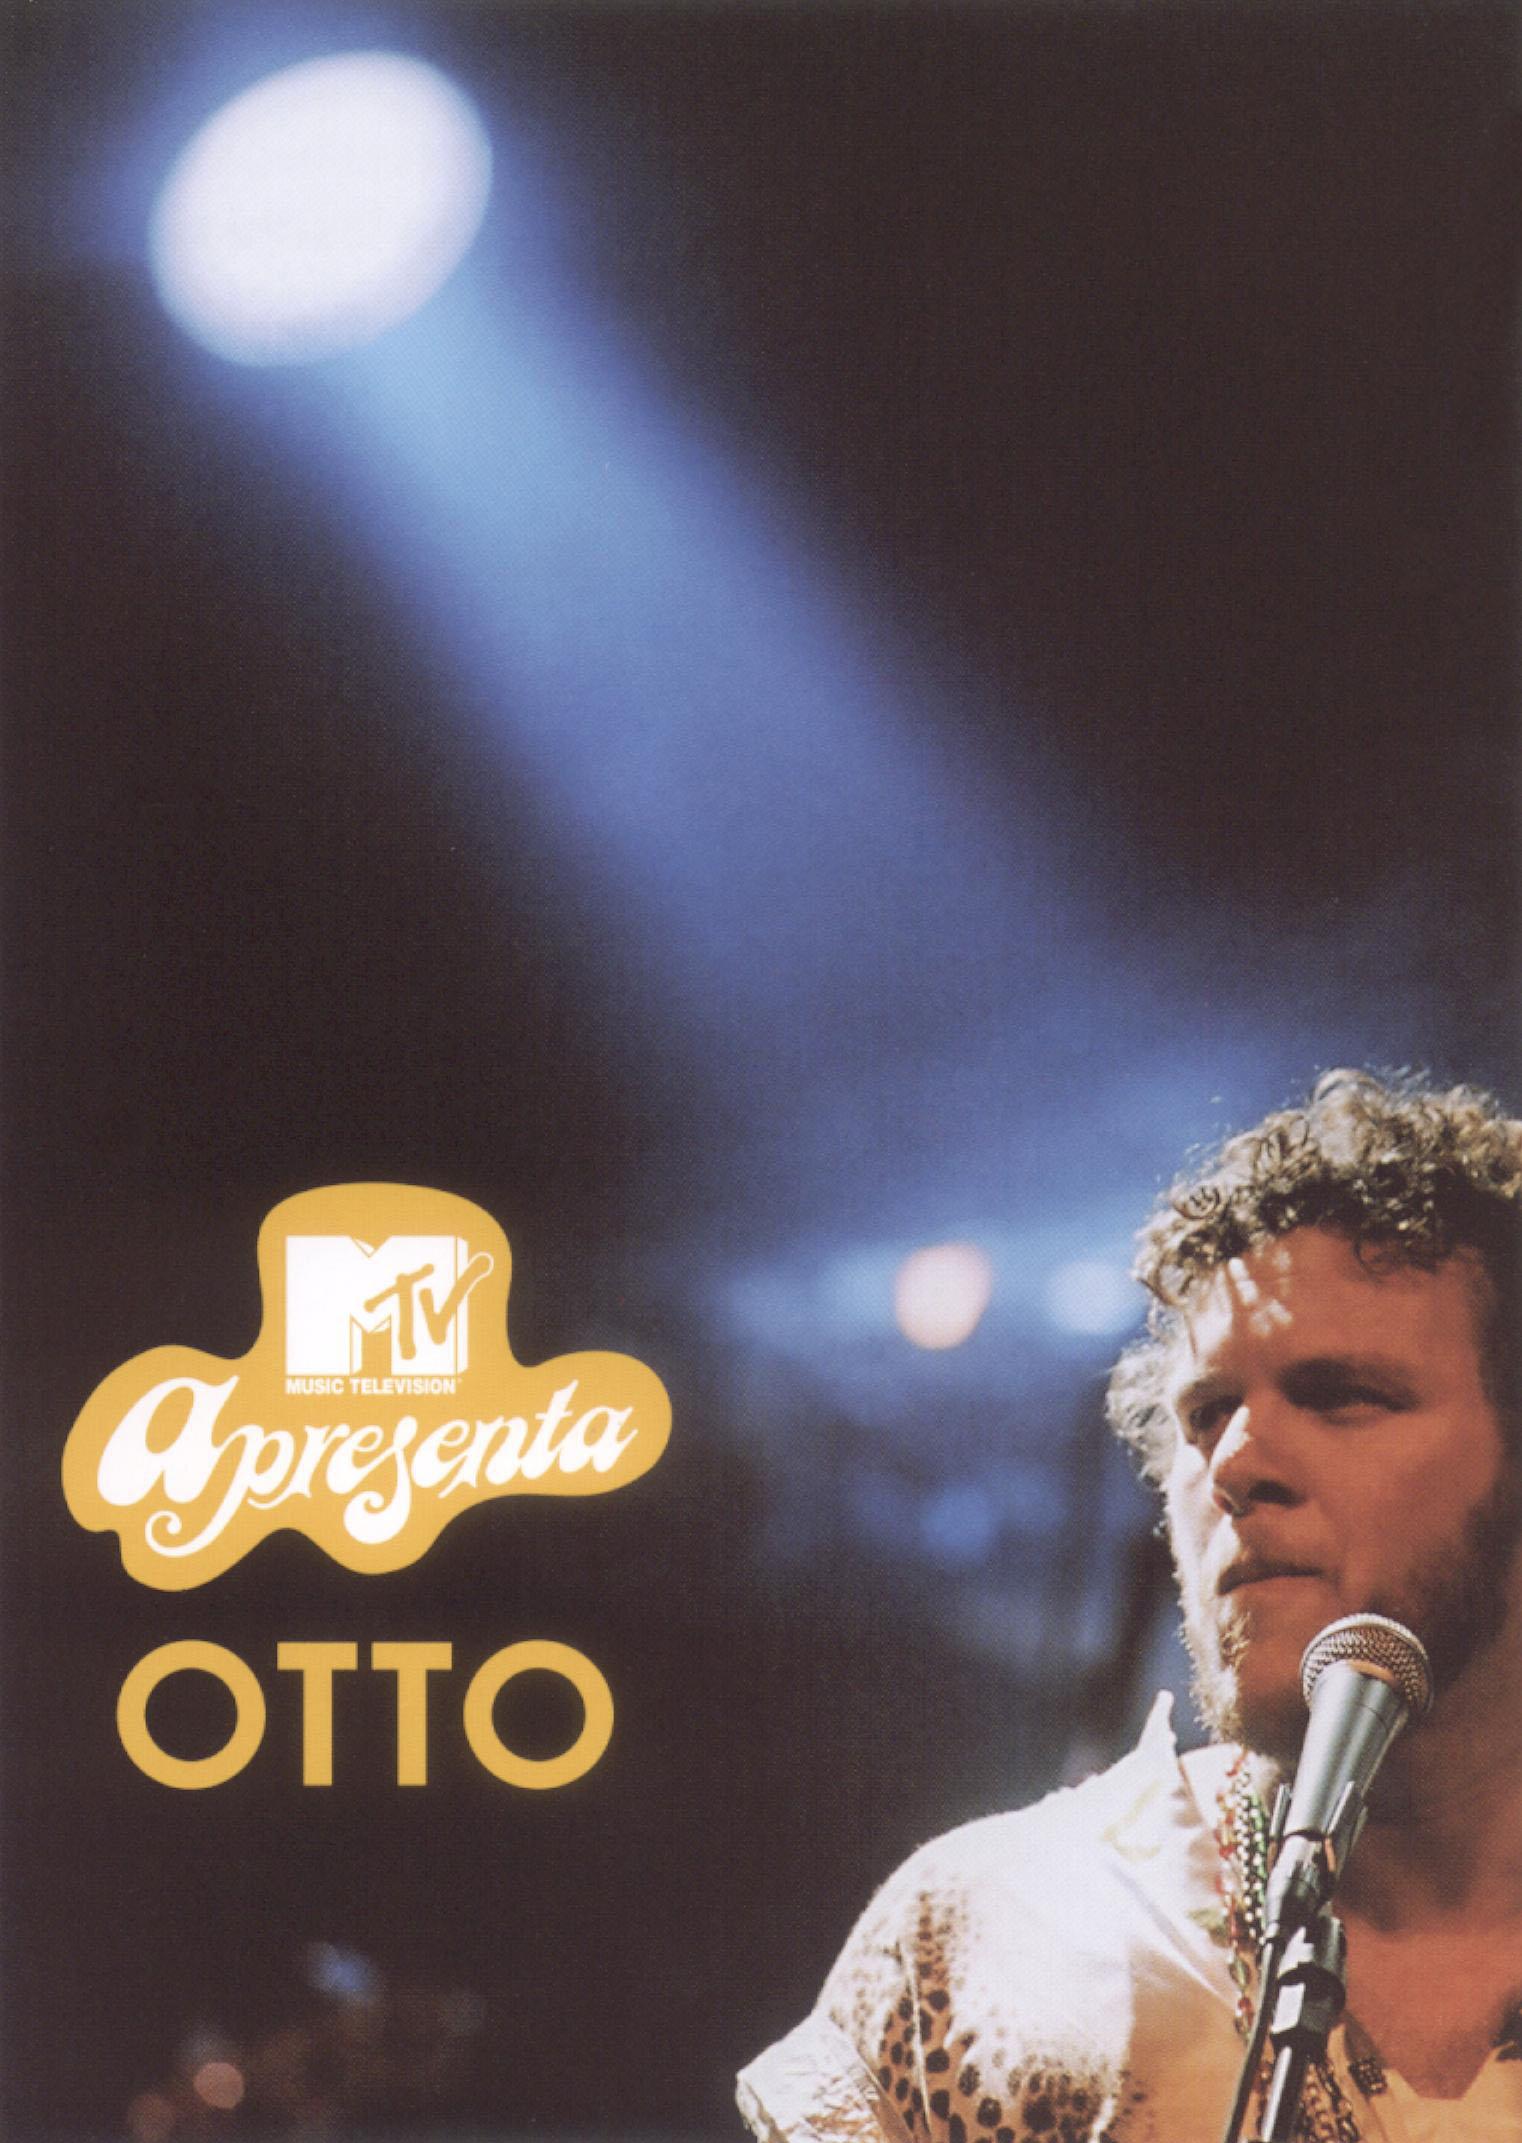 Otto: MTV Apresenta